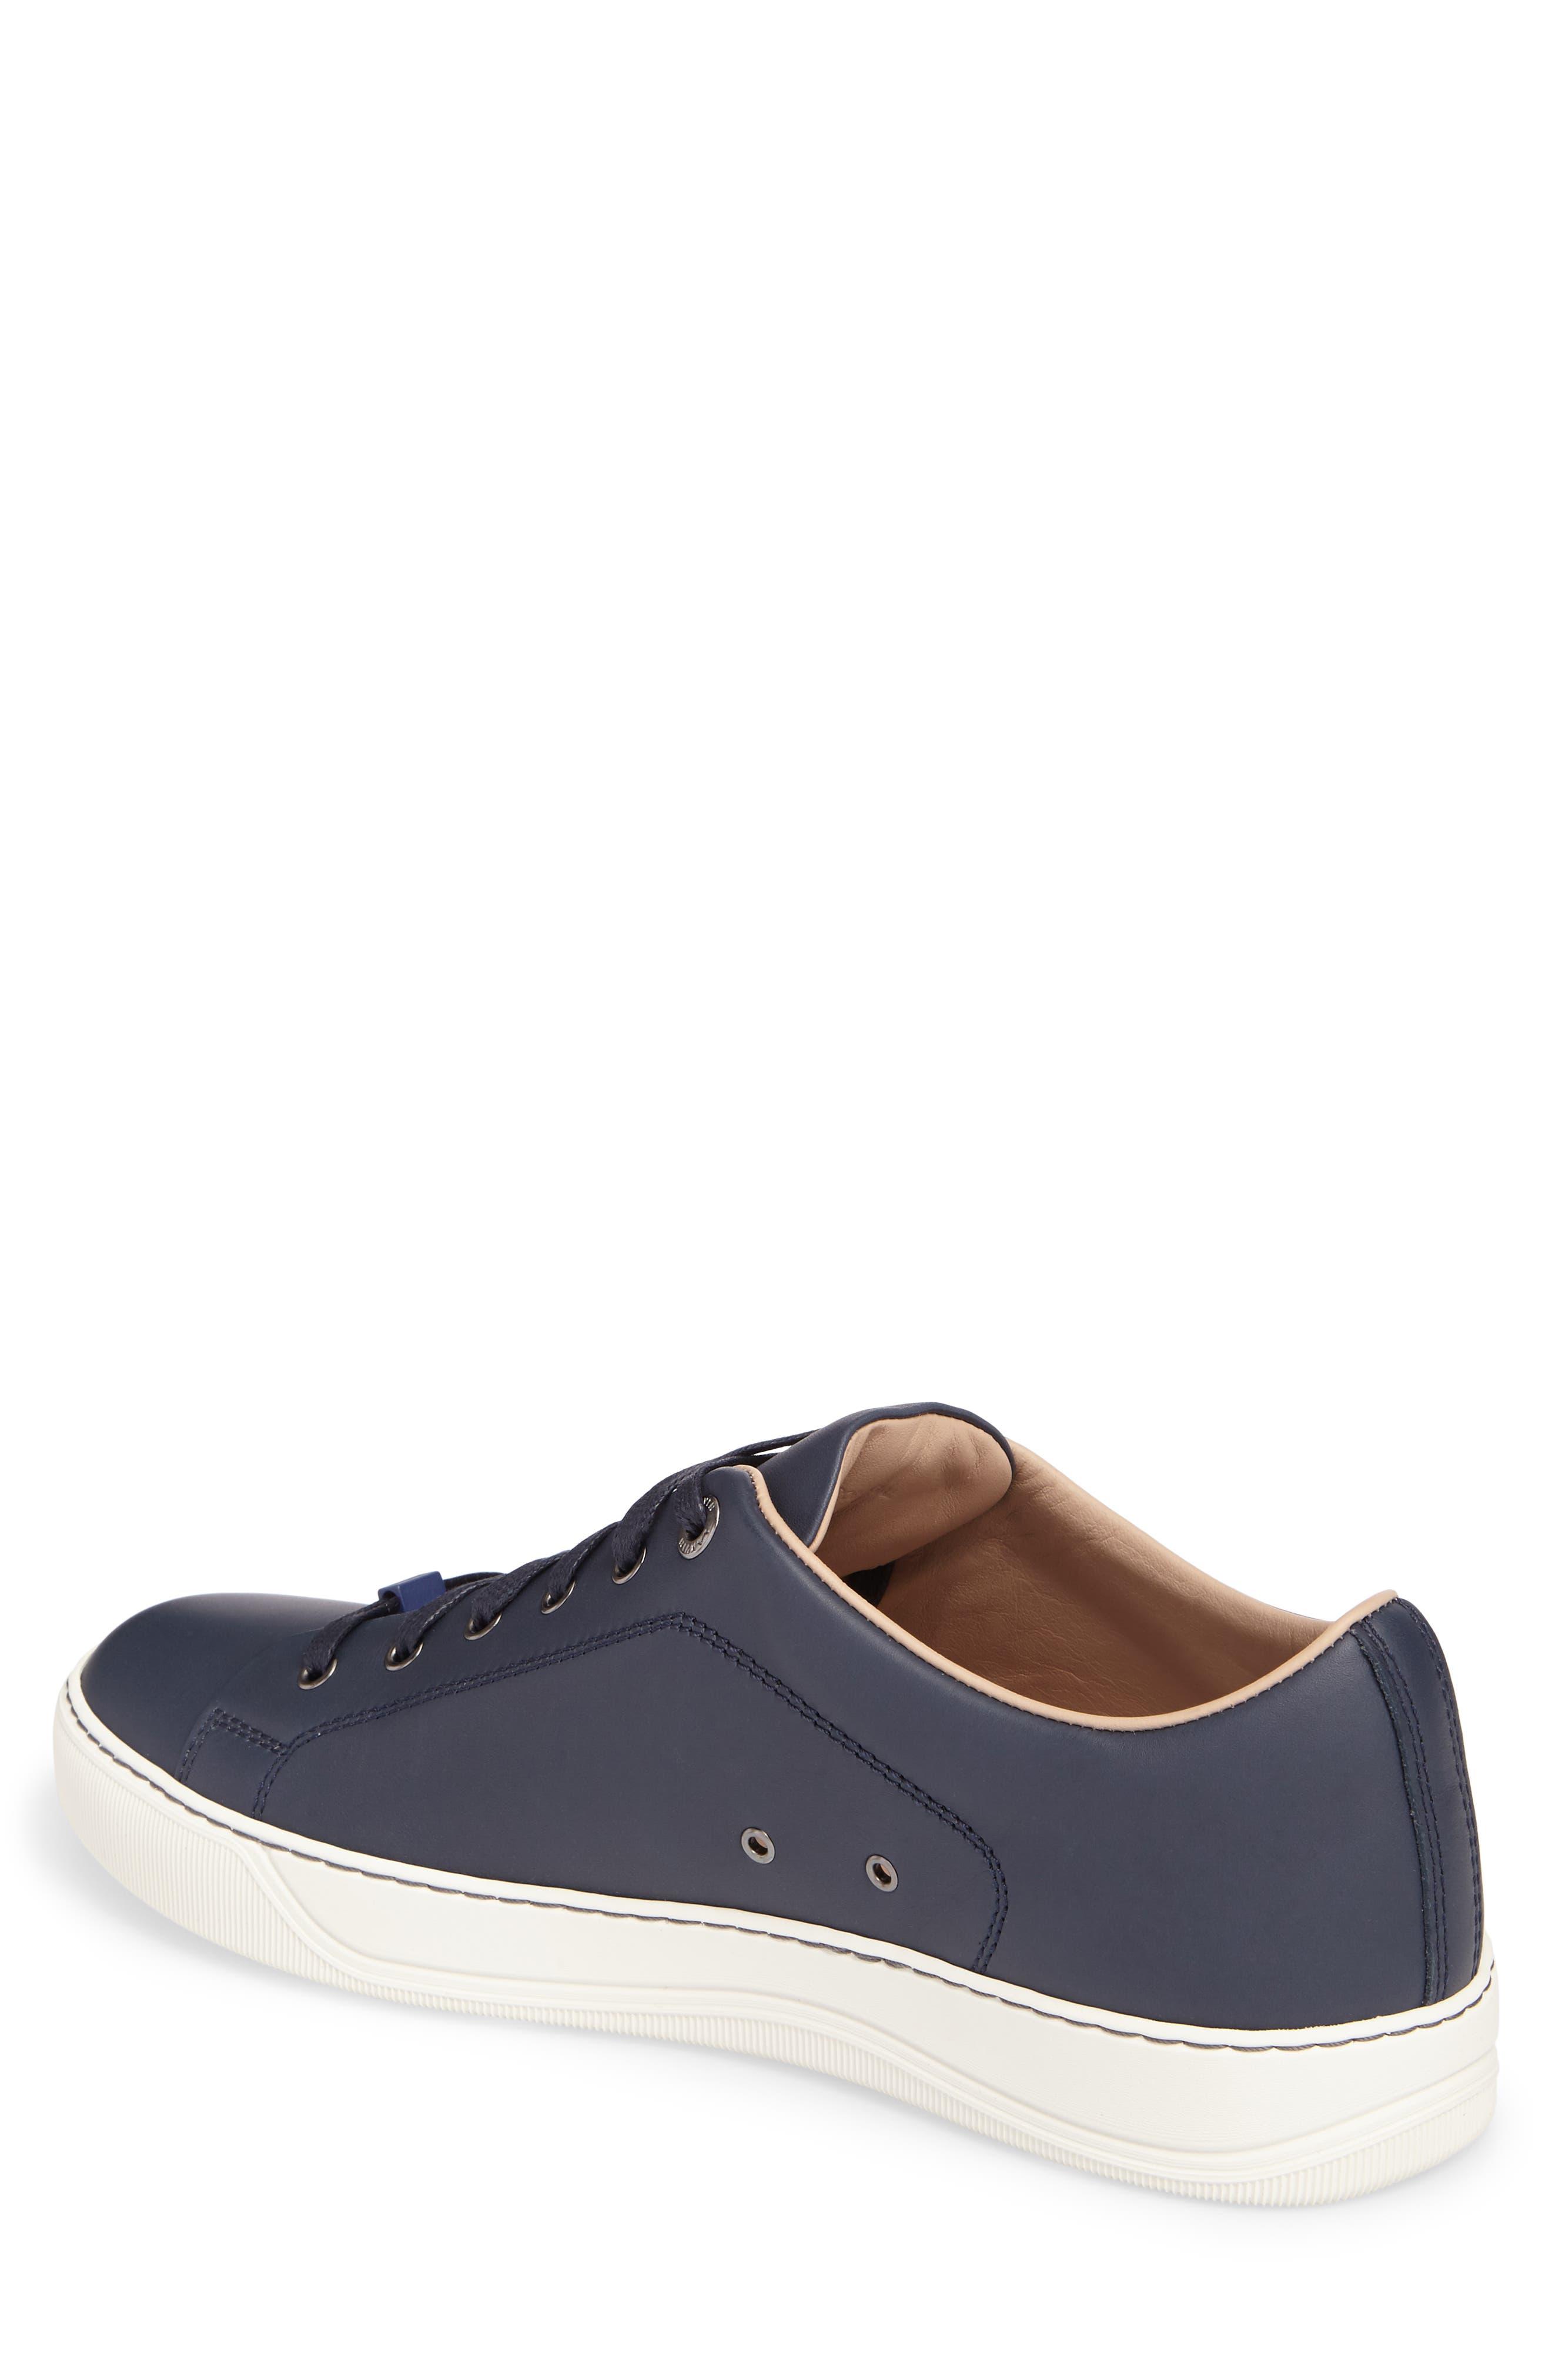 Alternate Image 2  - Lanvin Frye Nappa Sneaker (Men)